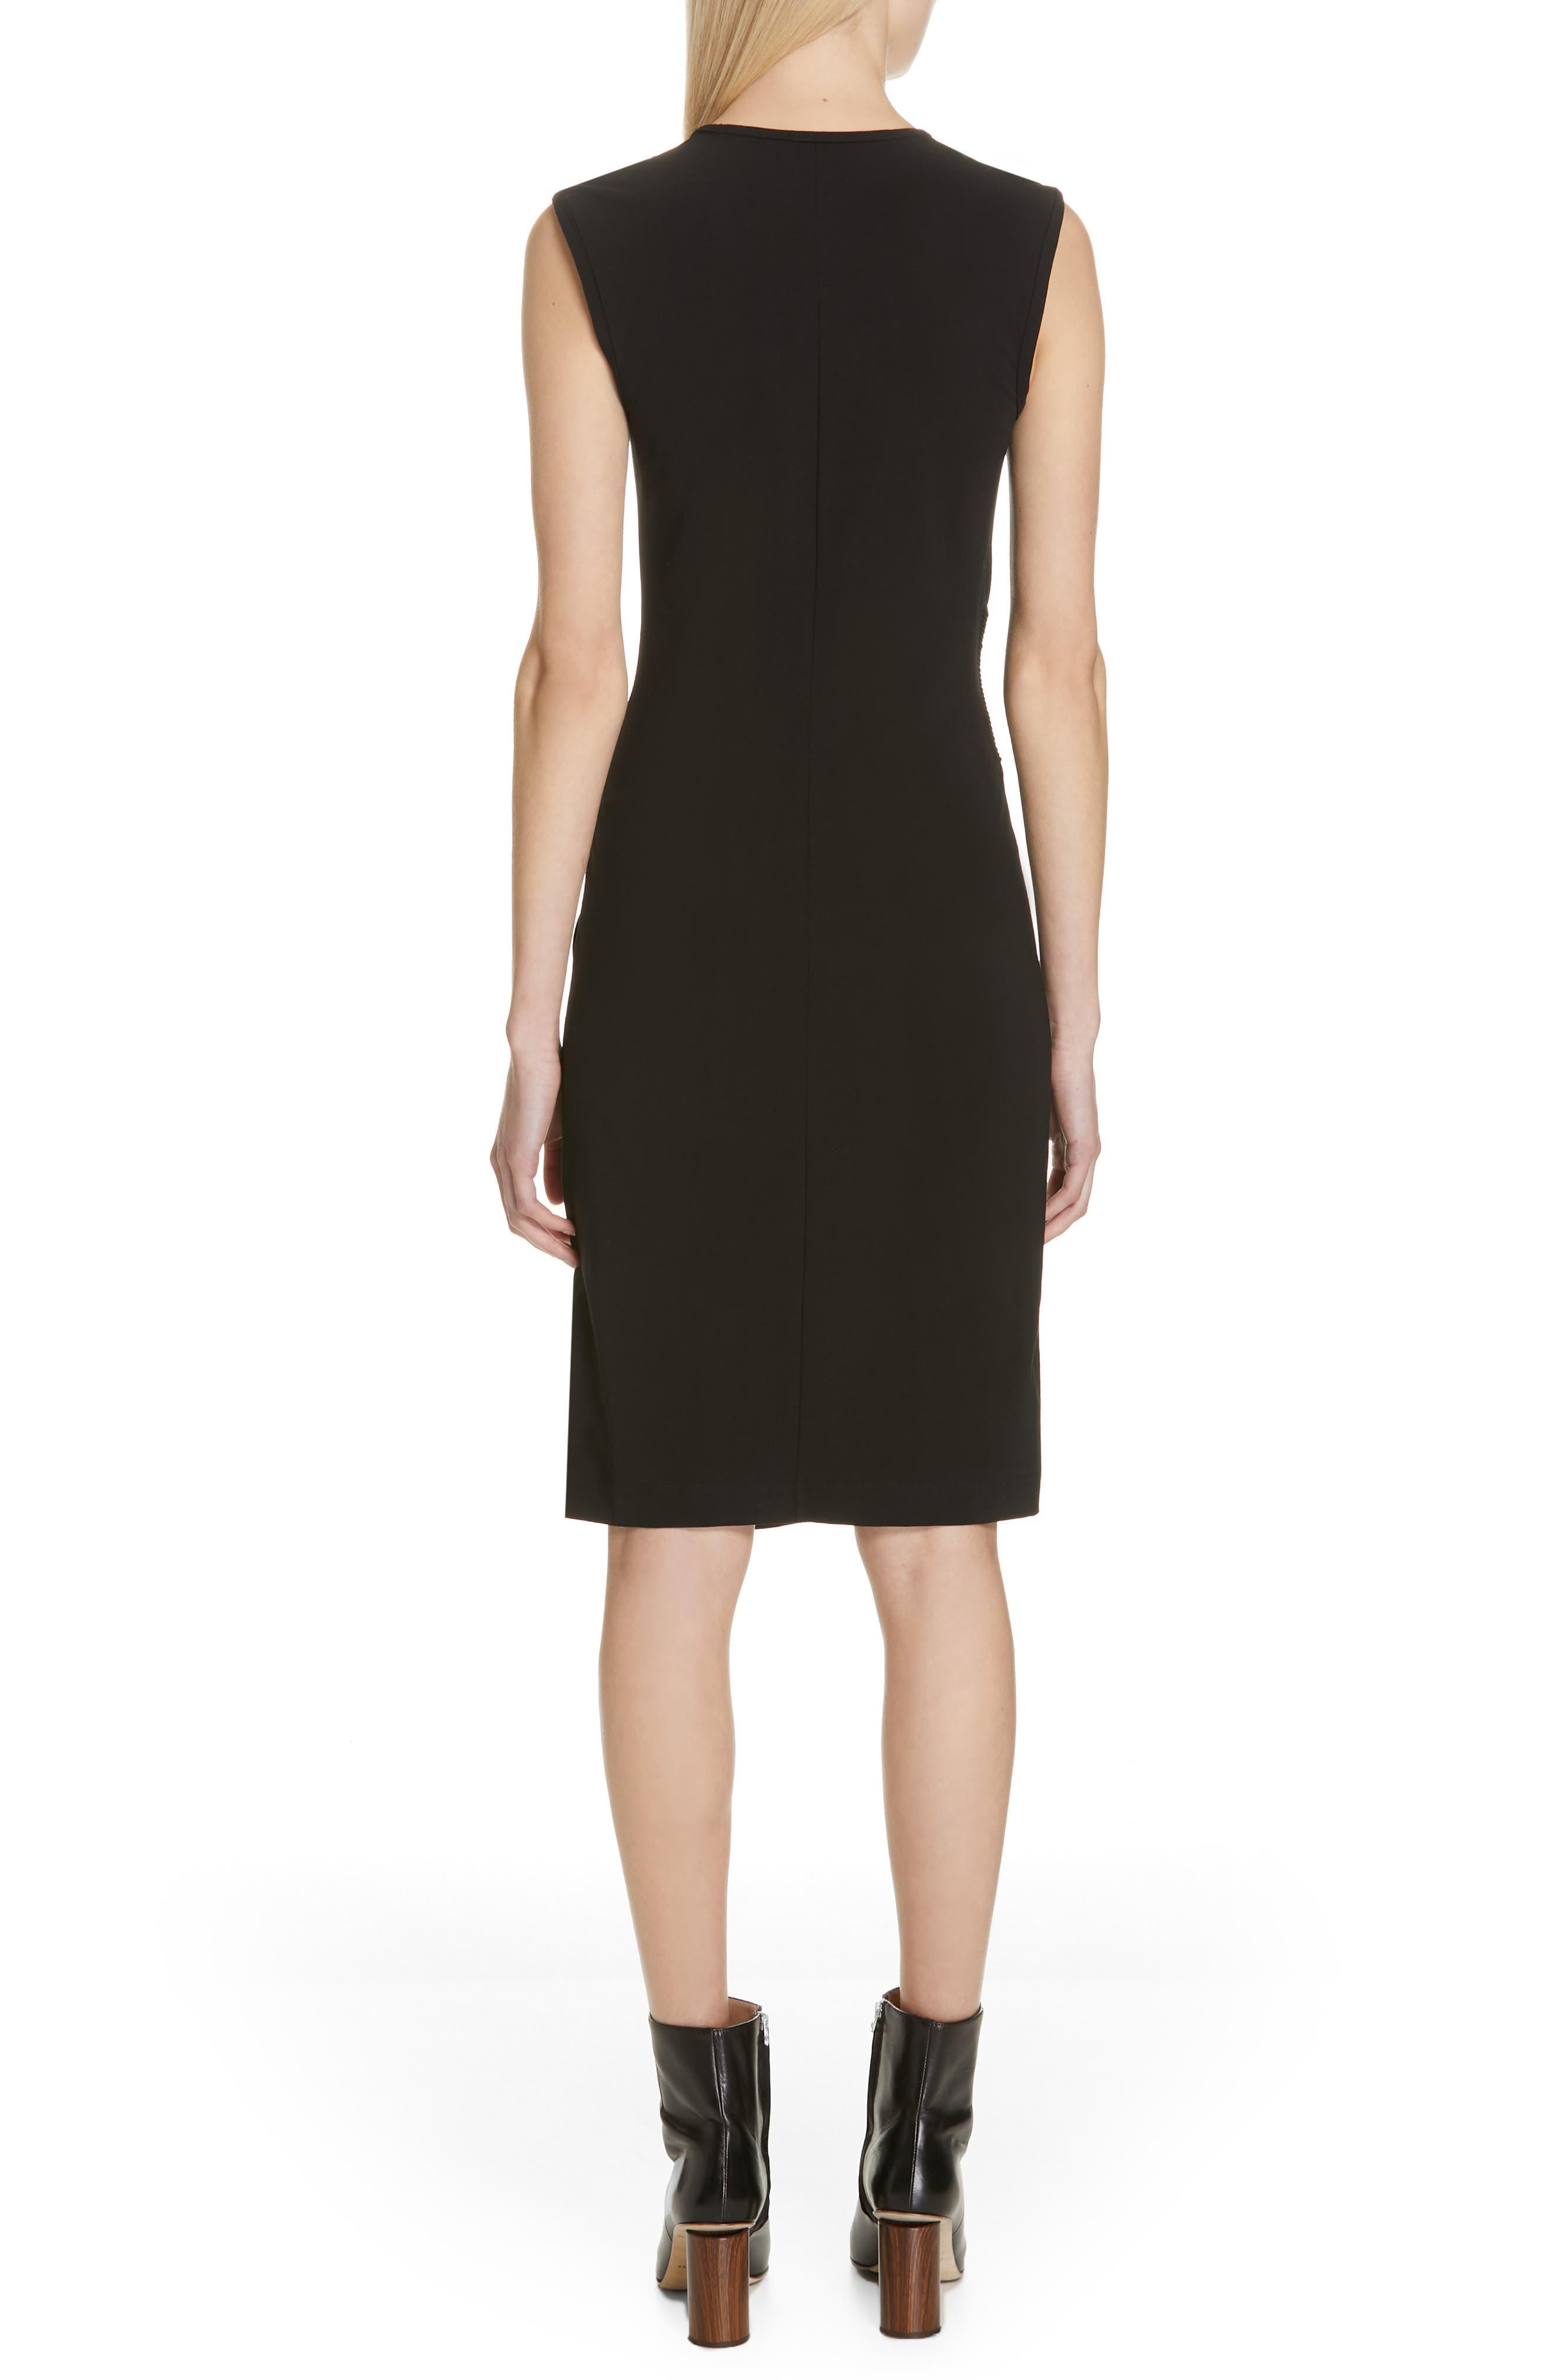 HELMUT LANG, Pleated Jersey Dress, Alternate thumbnail 2, color, BLACK